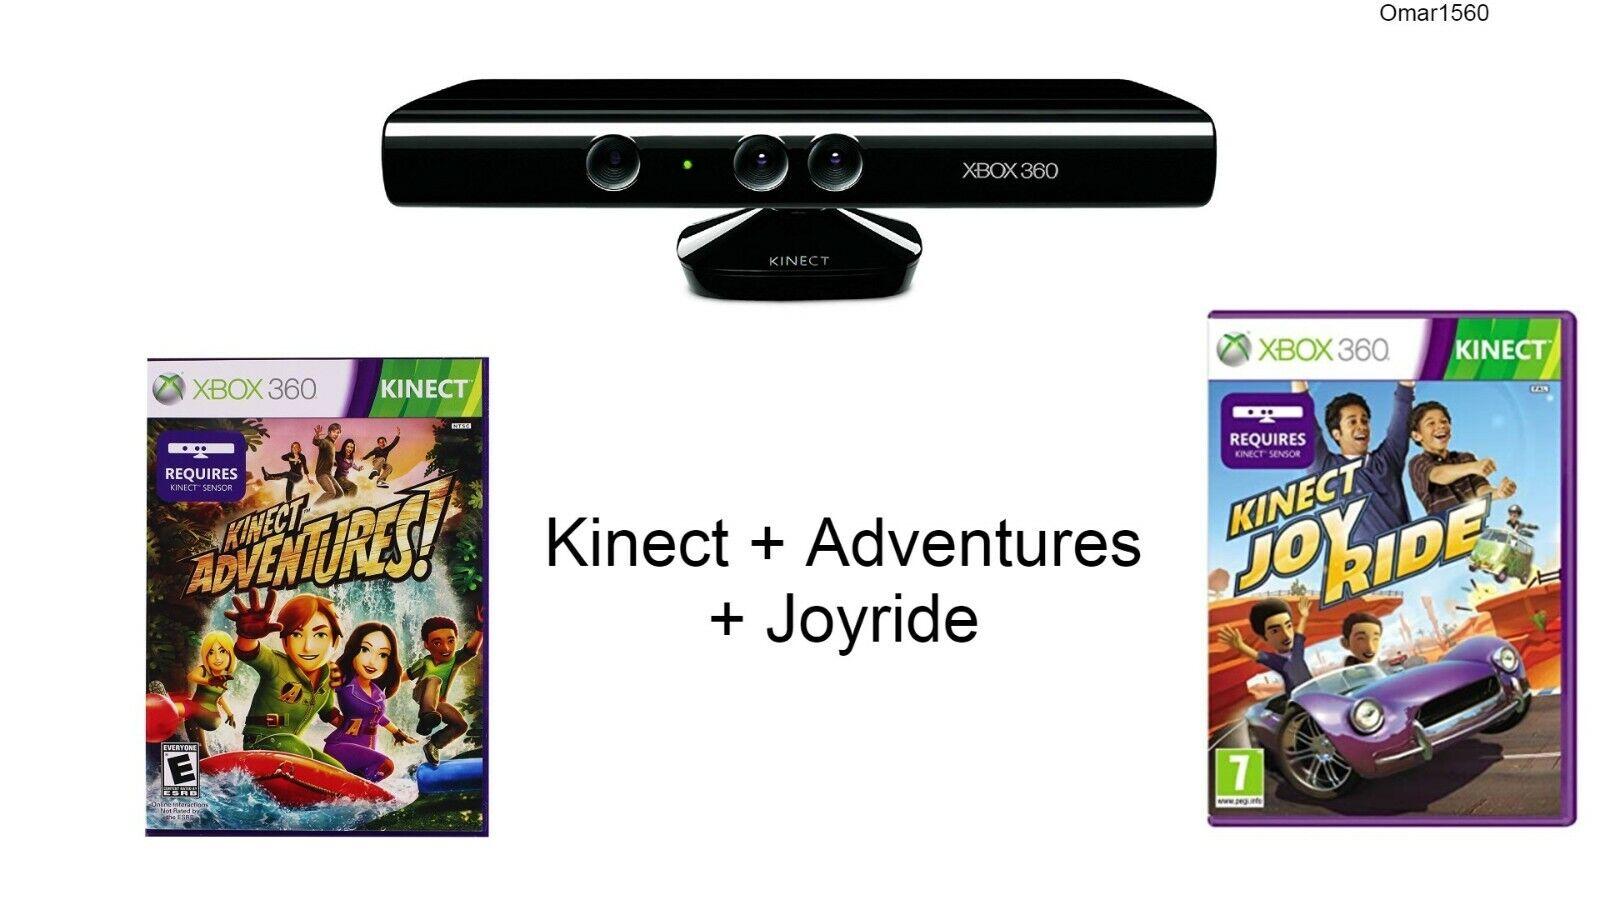 Kinect Sensor Xbox360 + Adventures + Joyride GAME Bundle Without Power Supply